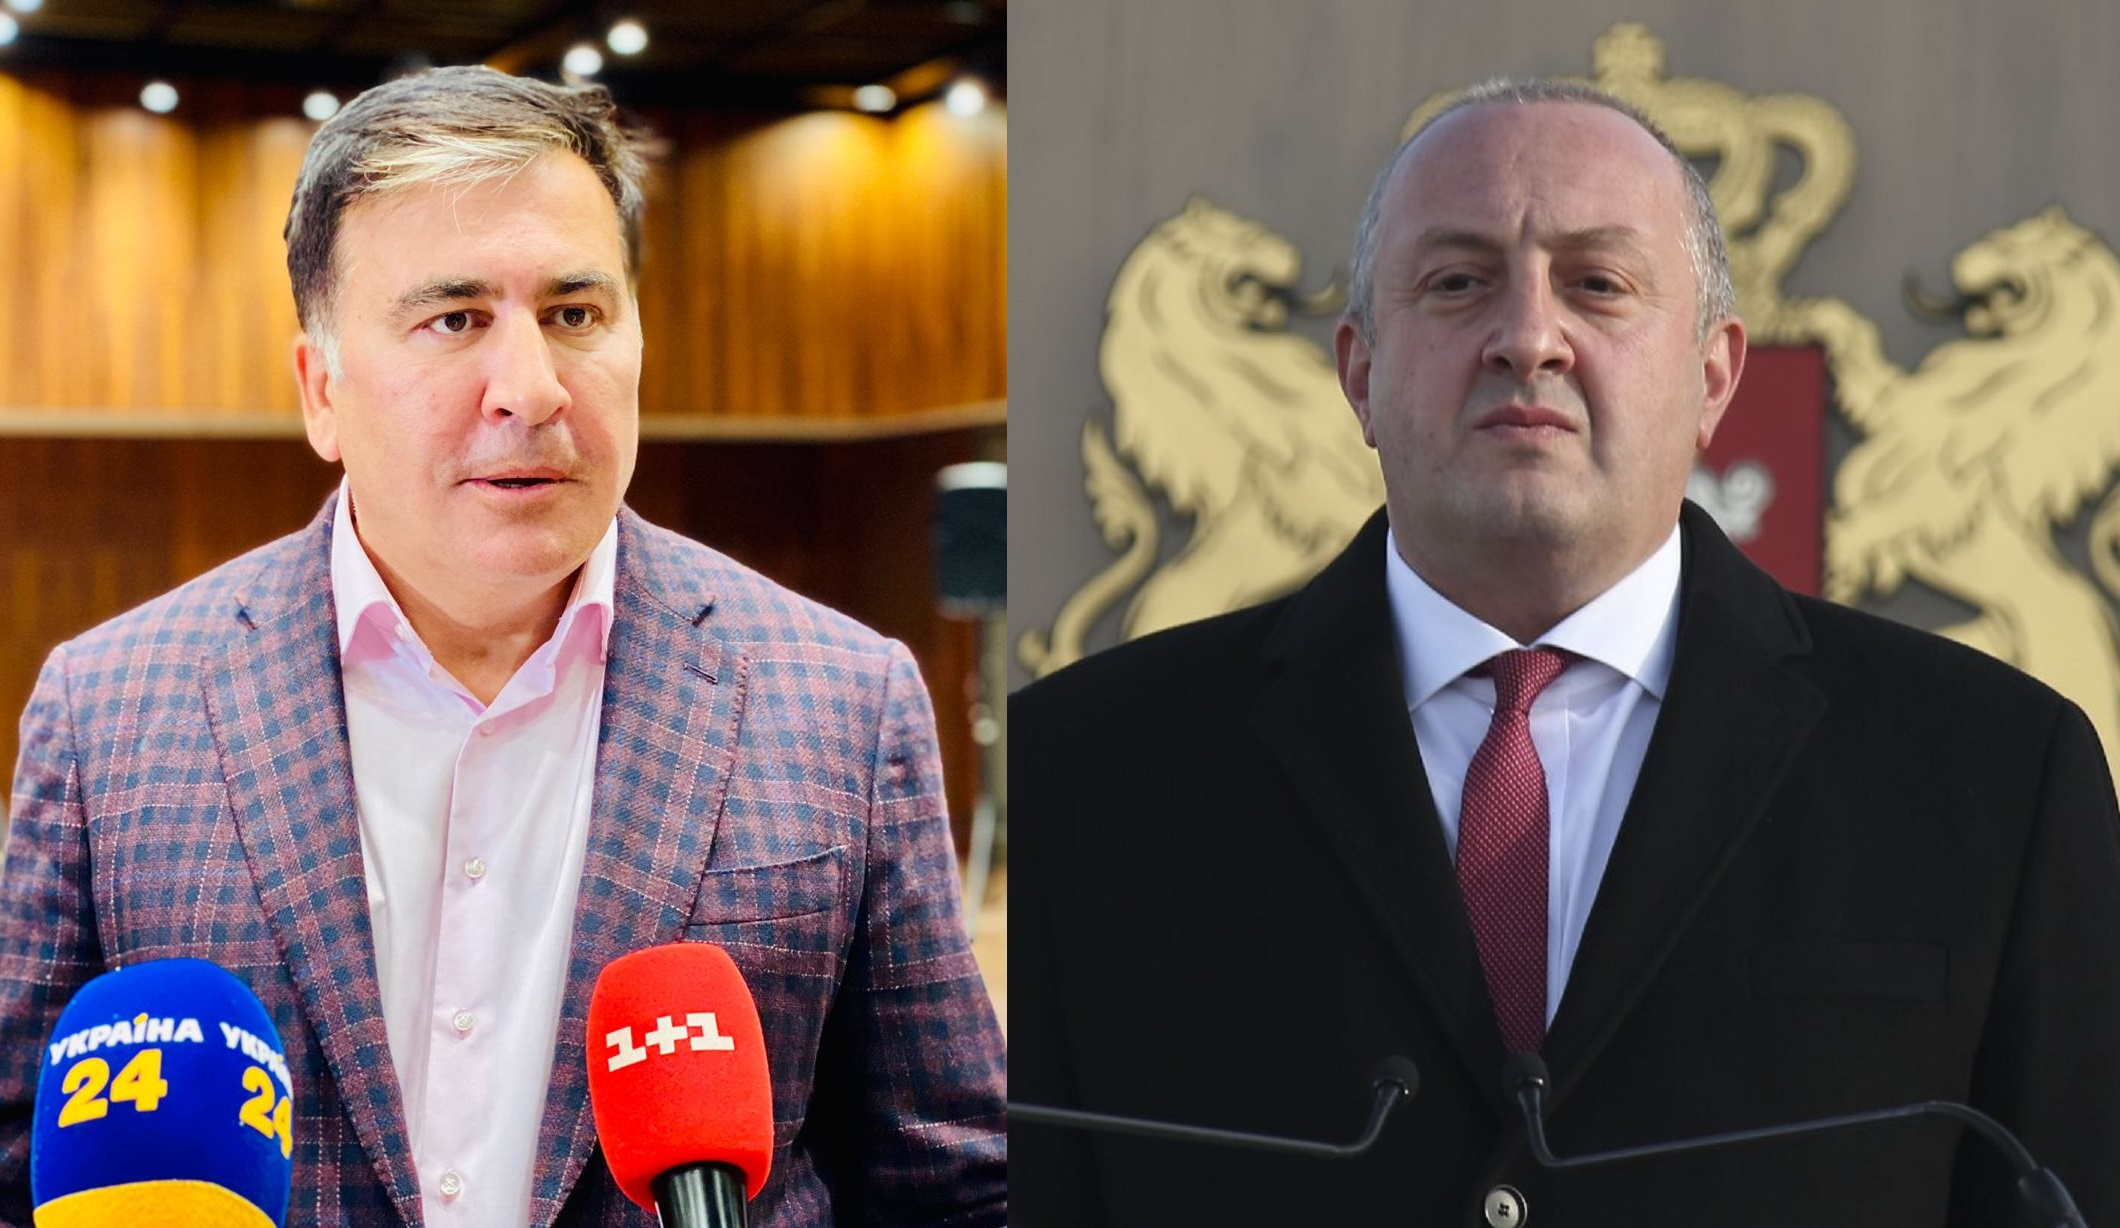 Saakashvili Margvelashvili #выборы-2020 Выборы 2020, Михаил Саакашвили